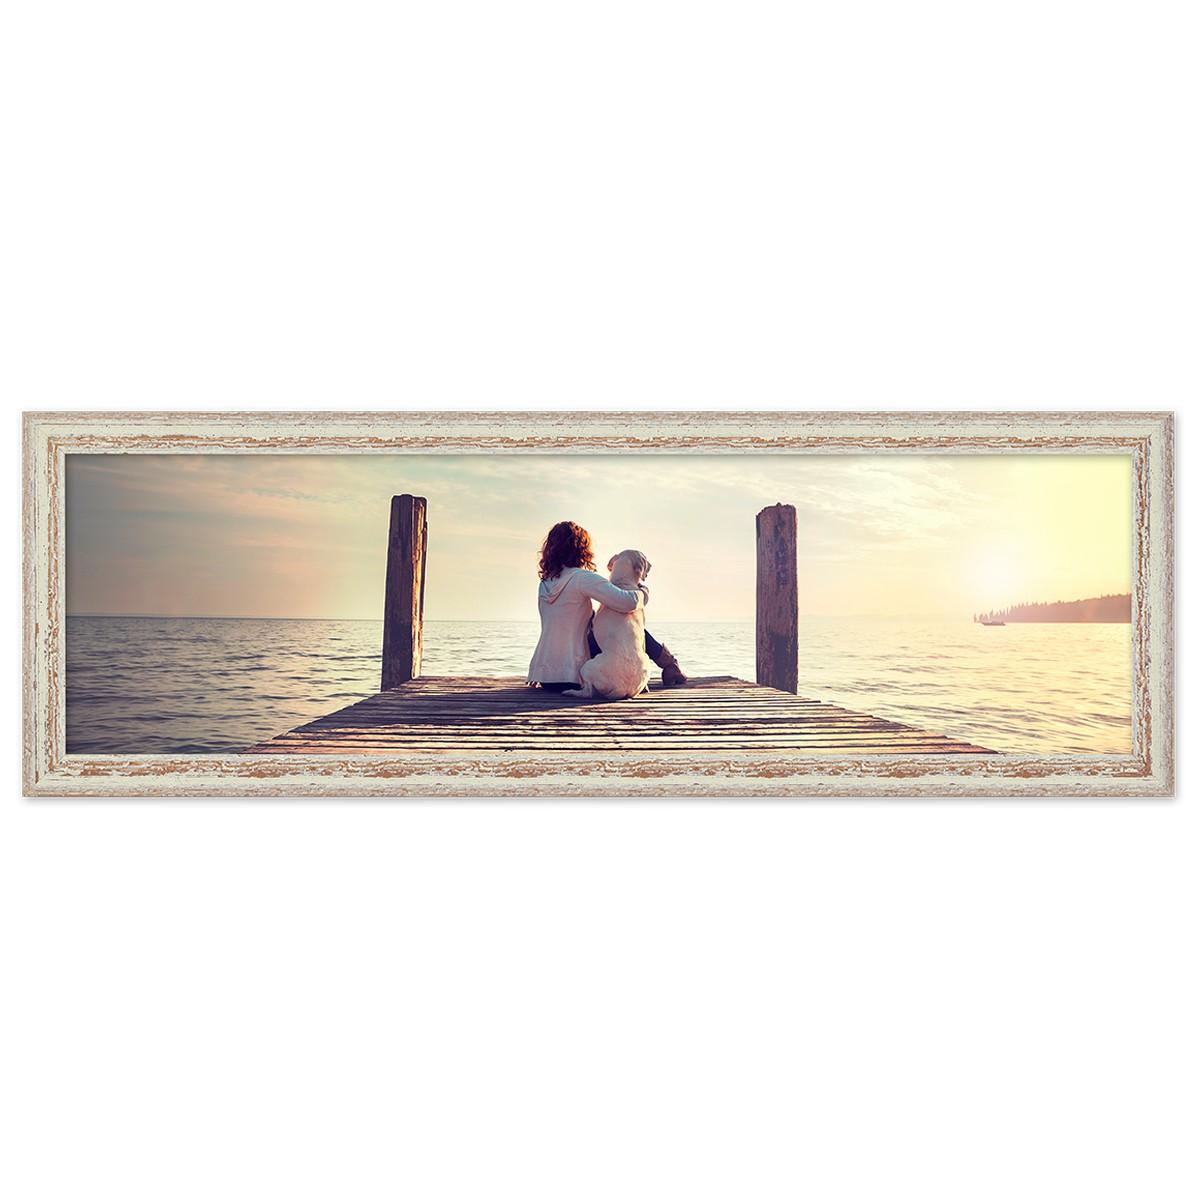 Panorama-Bilderrahmen Vintage 30x90 cm Weiss Shabby-Chic Massivholz ...